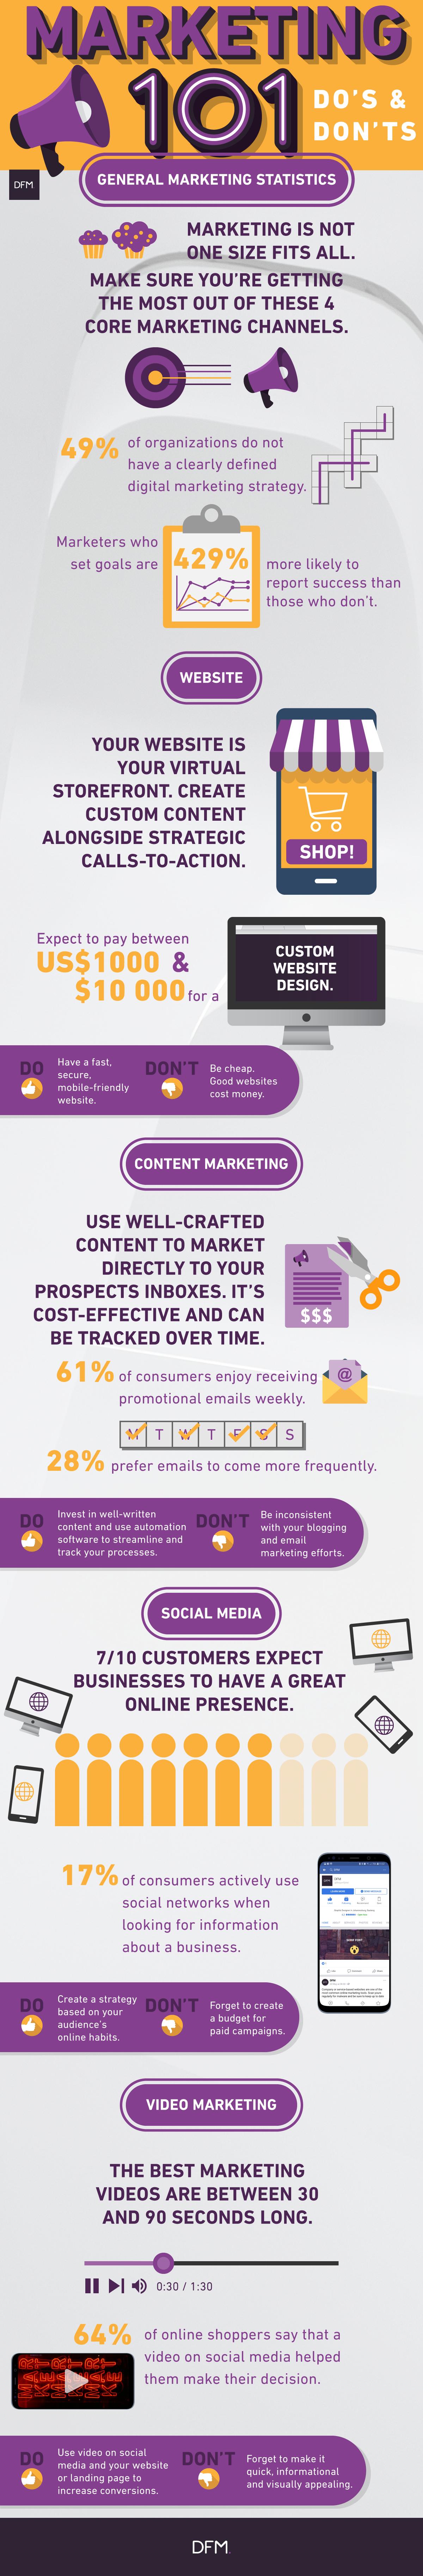 DFM Infographic Marketing Do's Don'ts